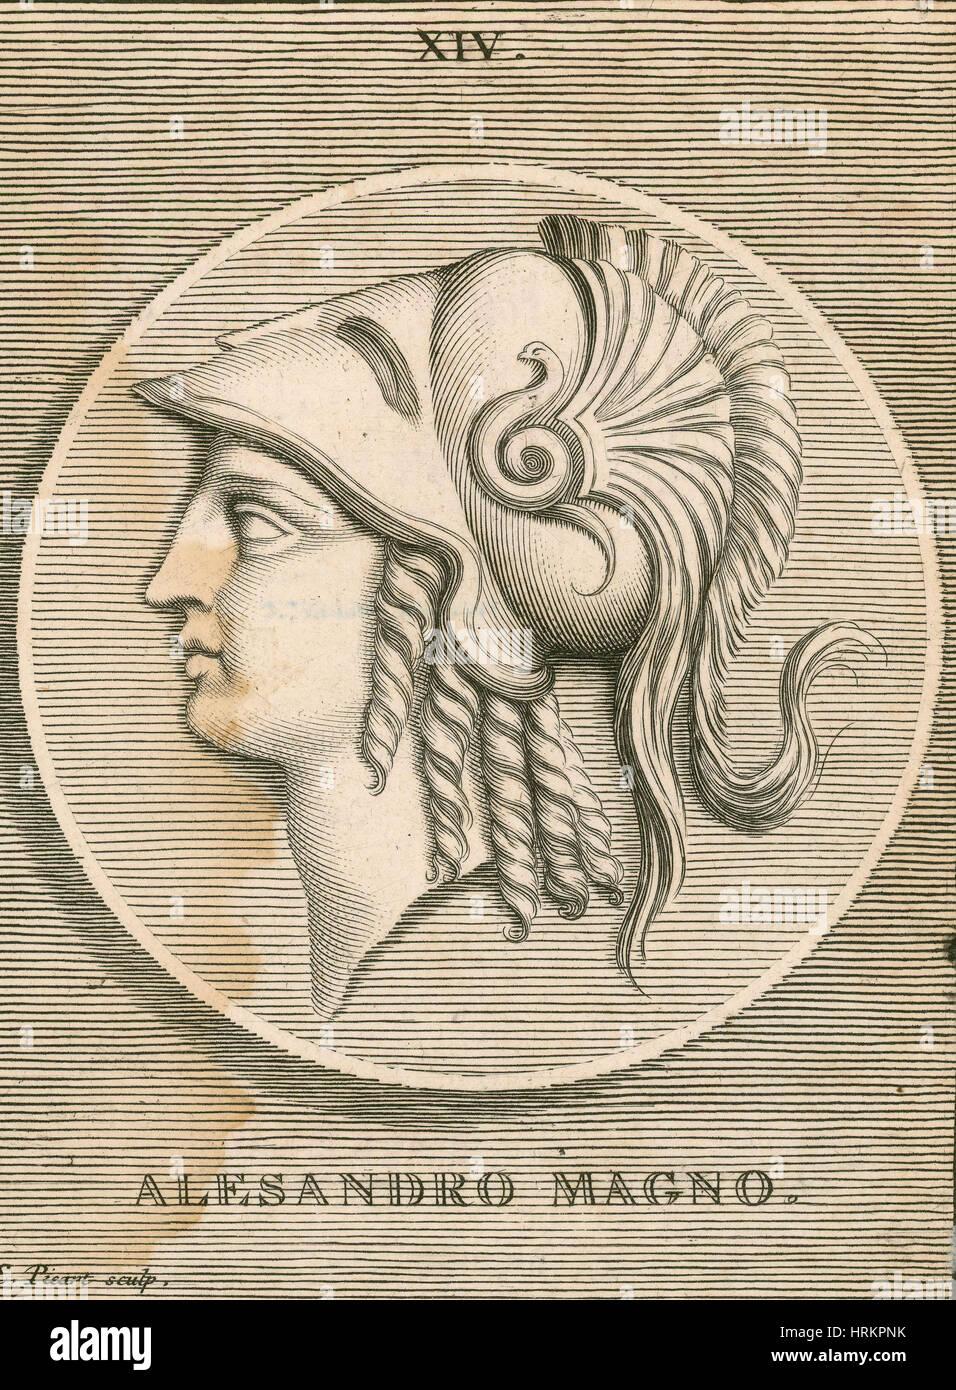 Alexander the Great, Greek King of Macedon - Stock Image